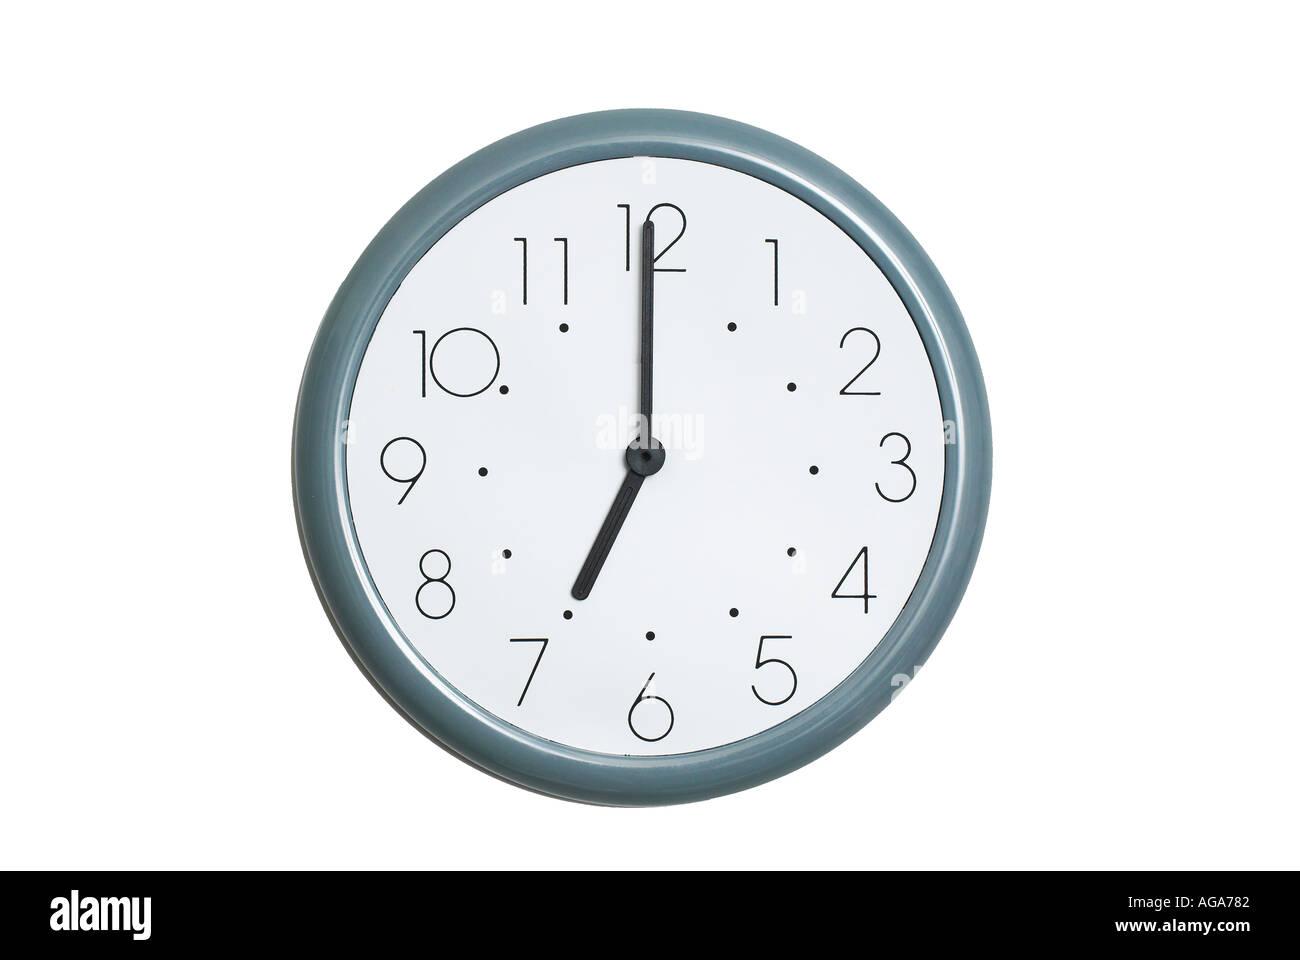 7 o clock - Stock Image